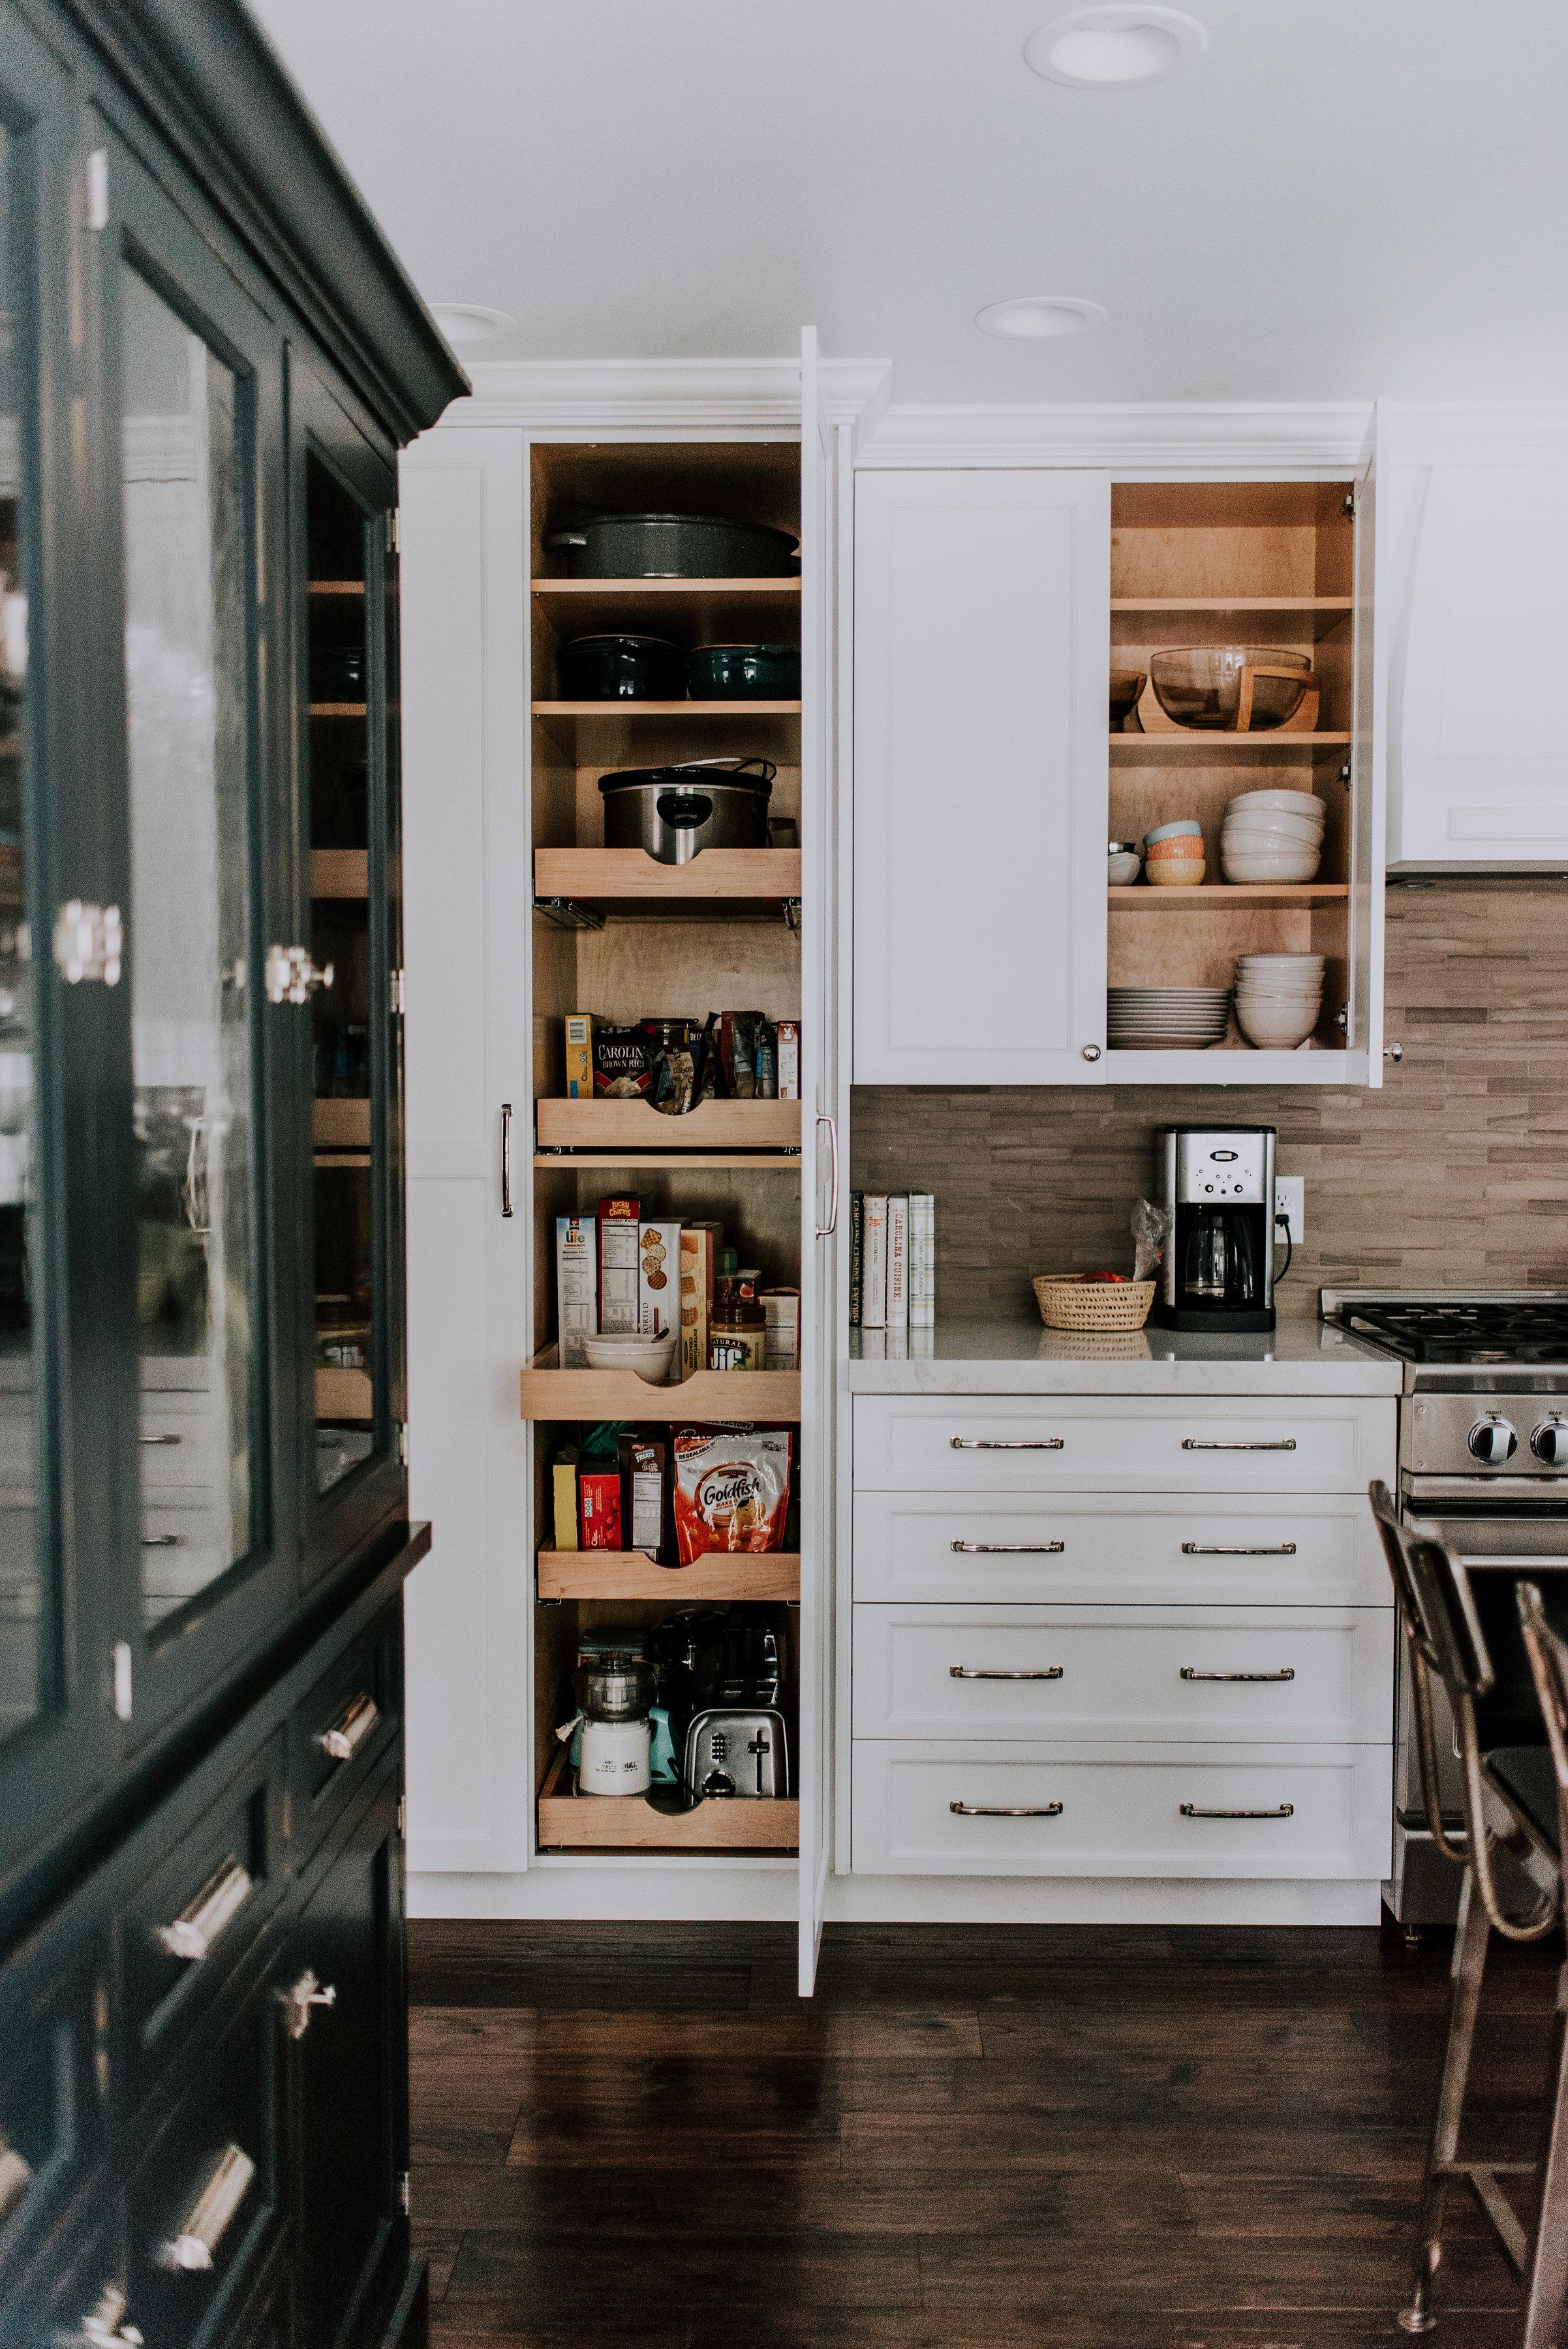 colby_kitchen.jpg